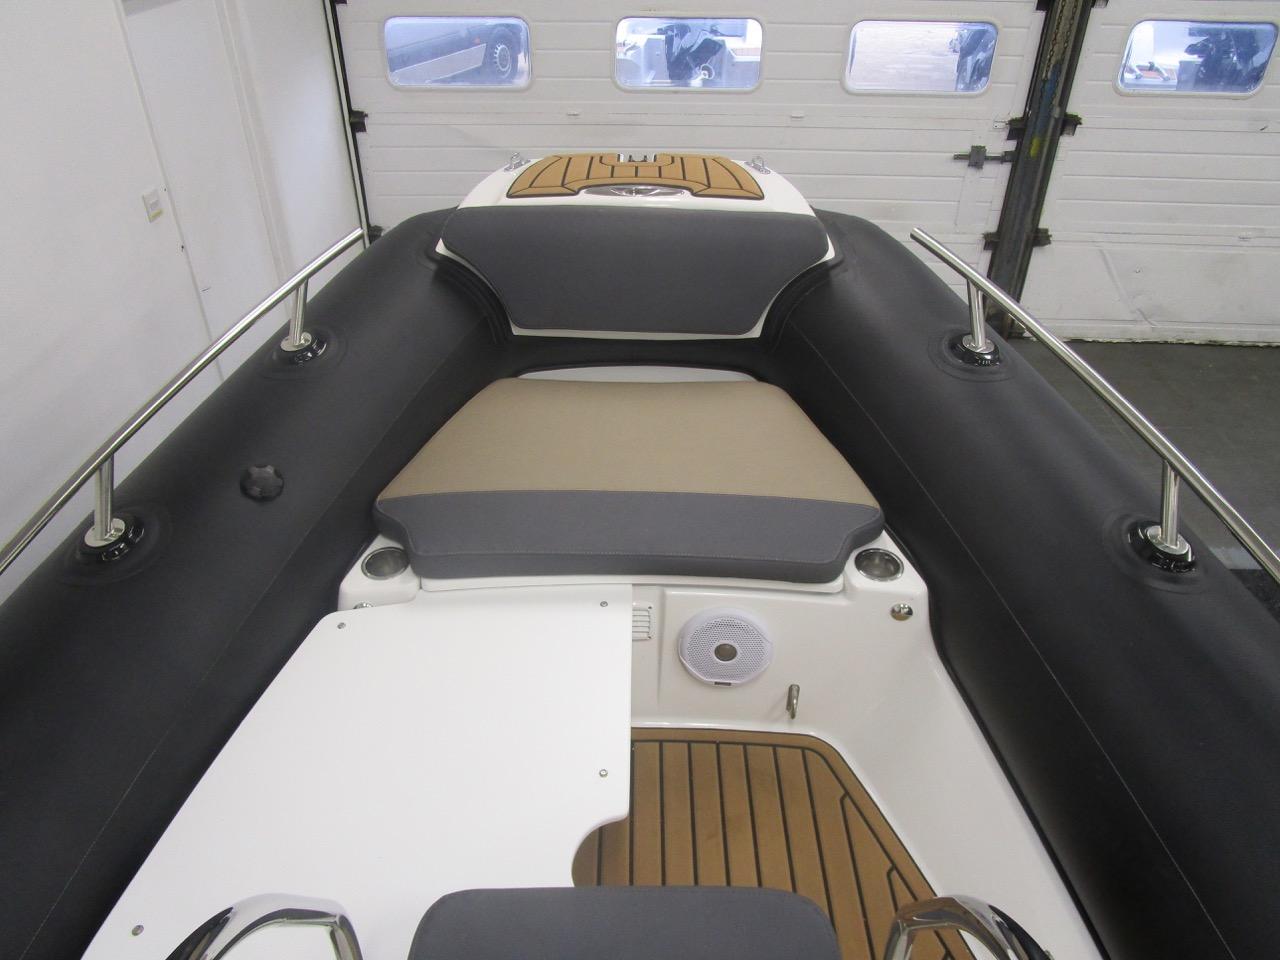 Grand RIB Golden Line G650 port sun deck fitted